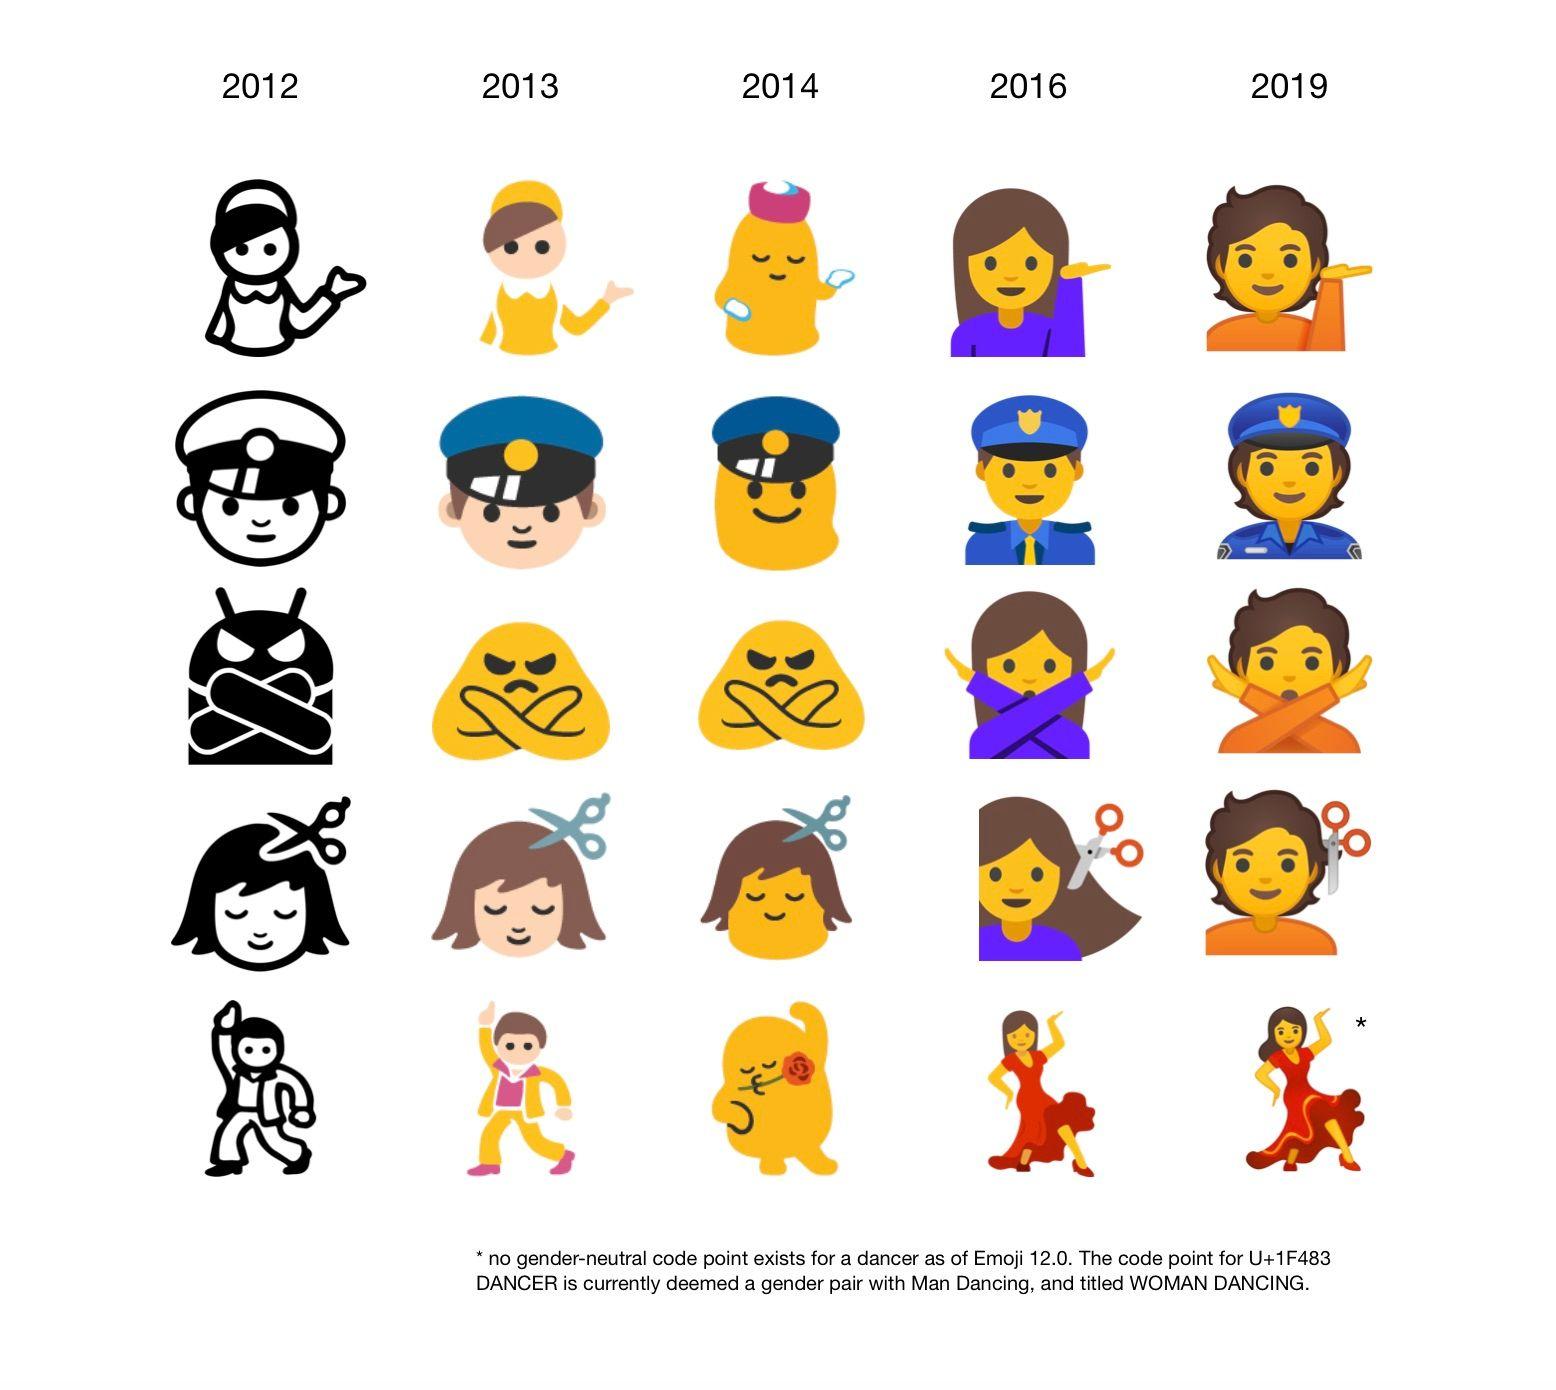 android-gender-evolution-emojipedia-2019